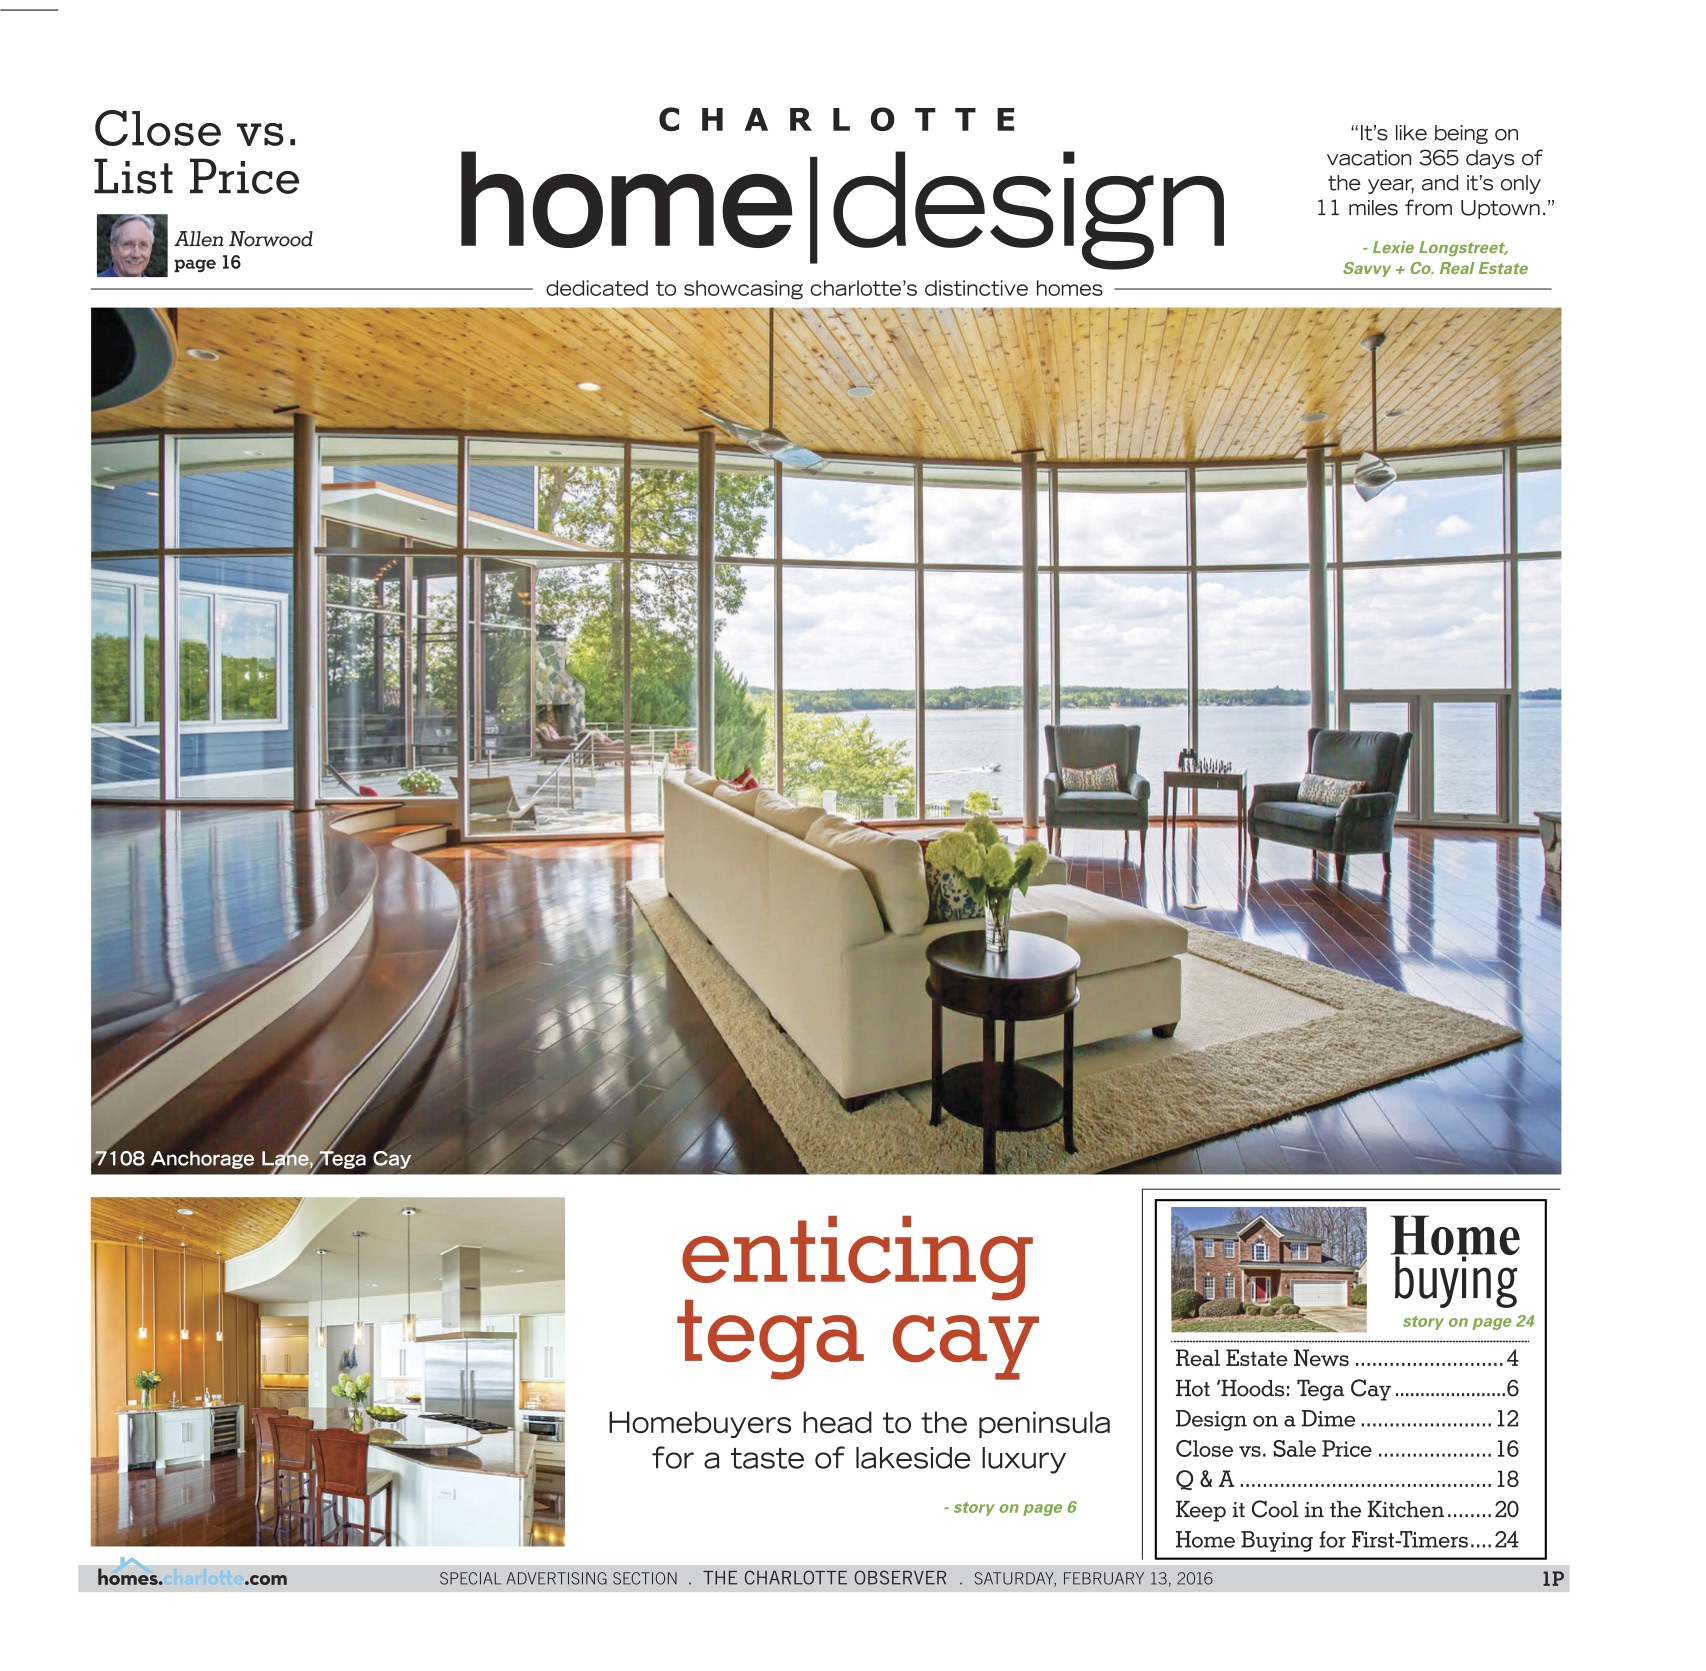 Charlotte Home|Design February 13, 2016